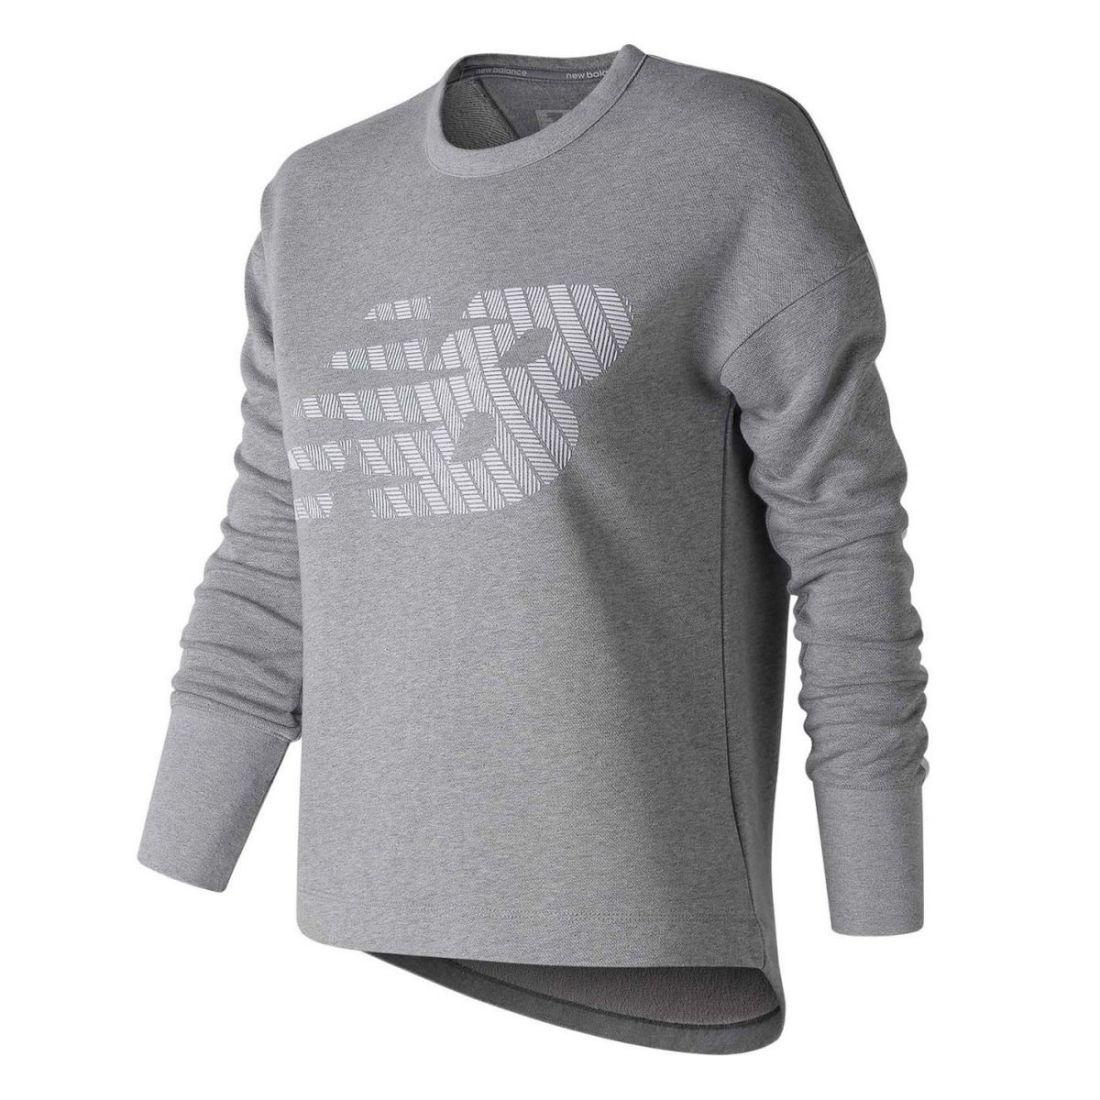 e36052e99e99c Image is loading New-Balance-Womens-Fleece-Crew-Top-Sweater-Jumper-